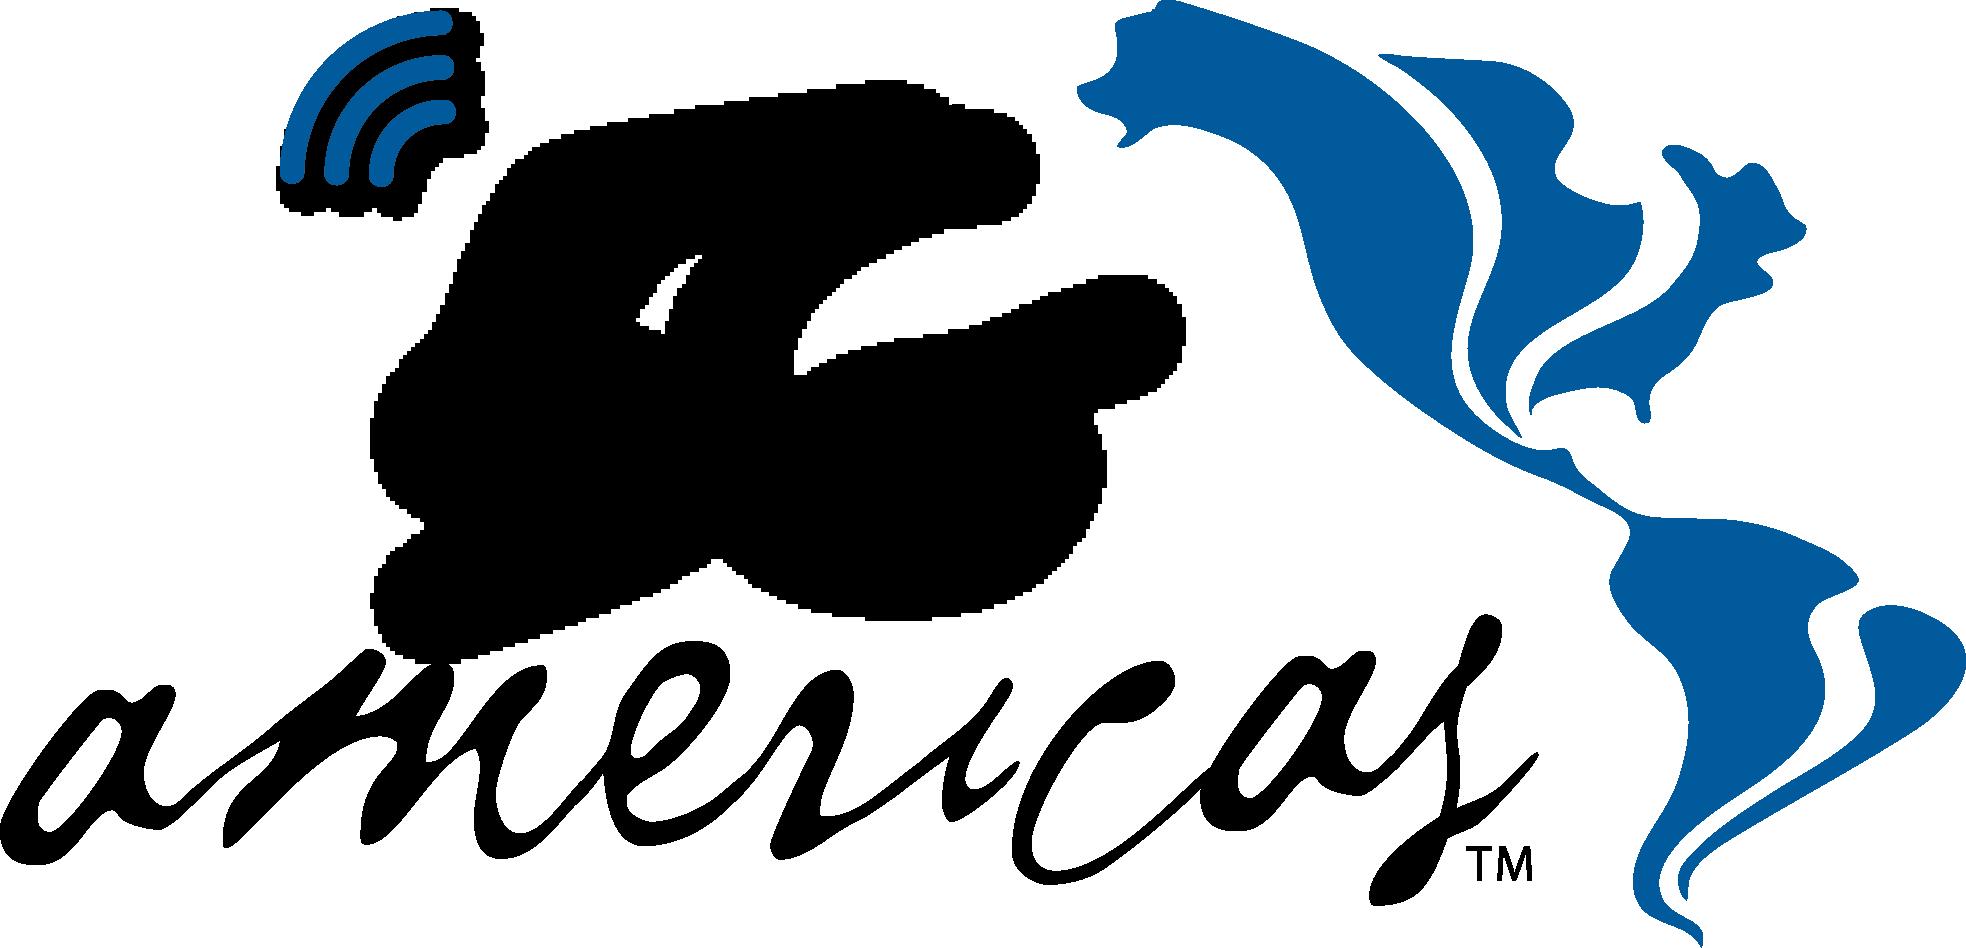 5G_Americas_logo